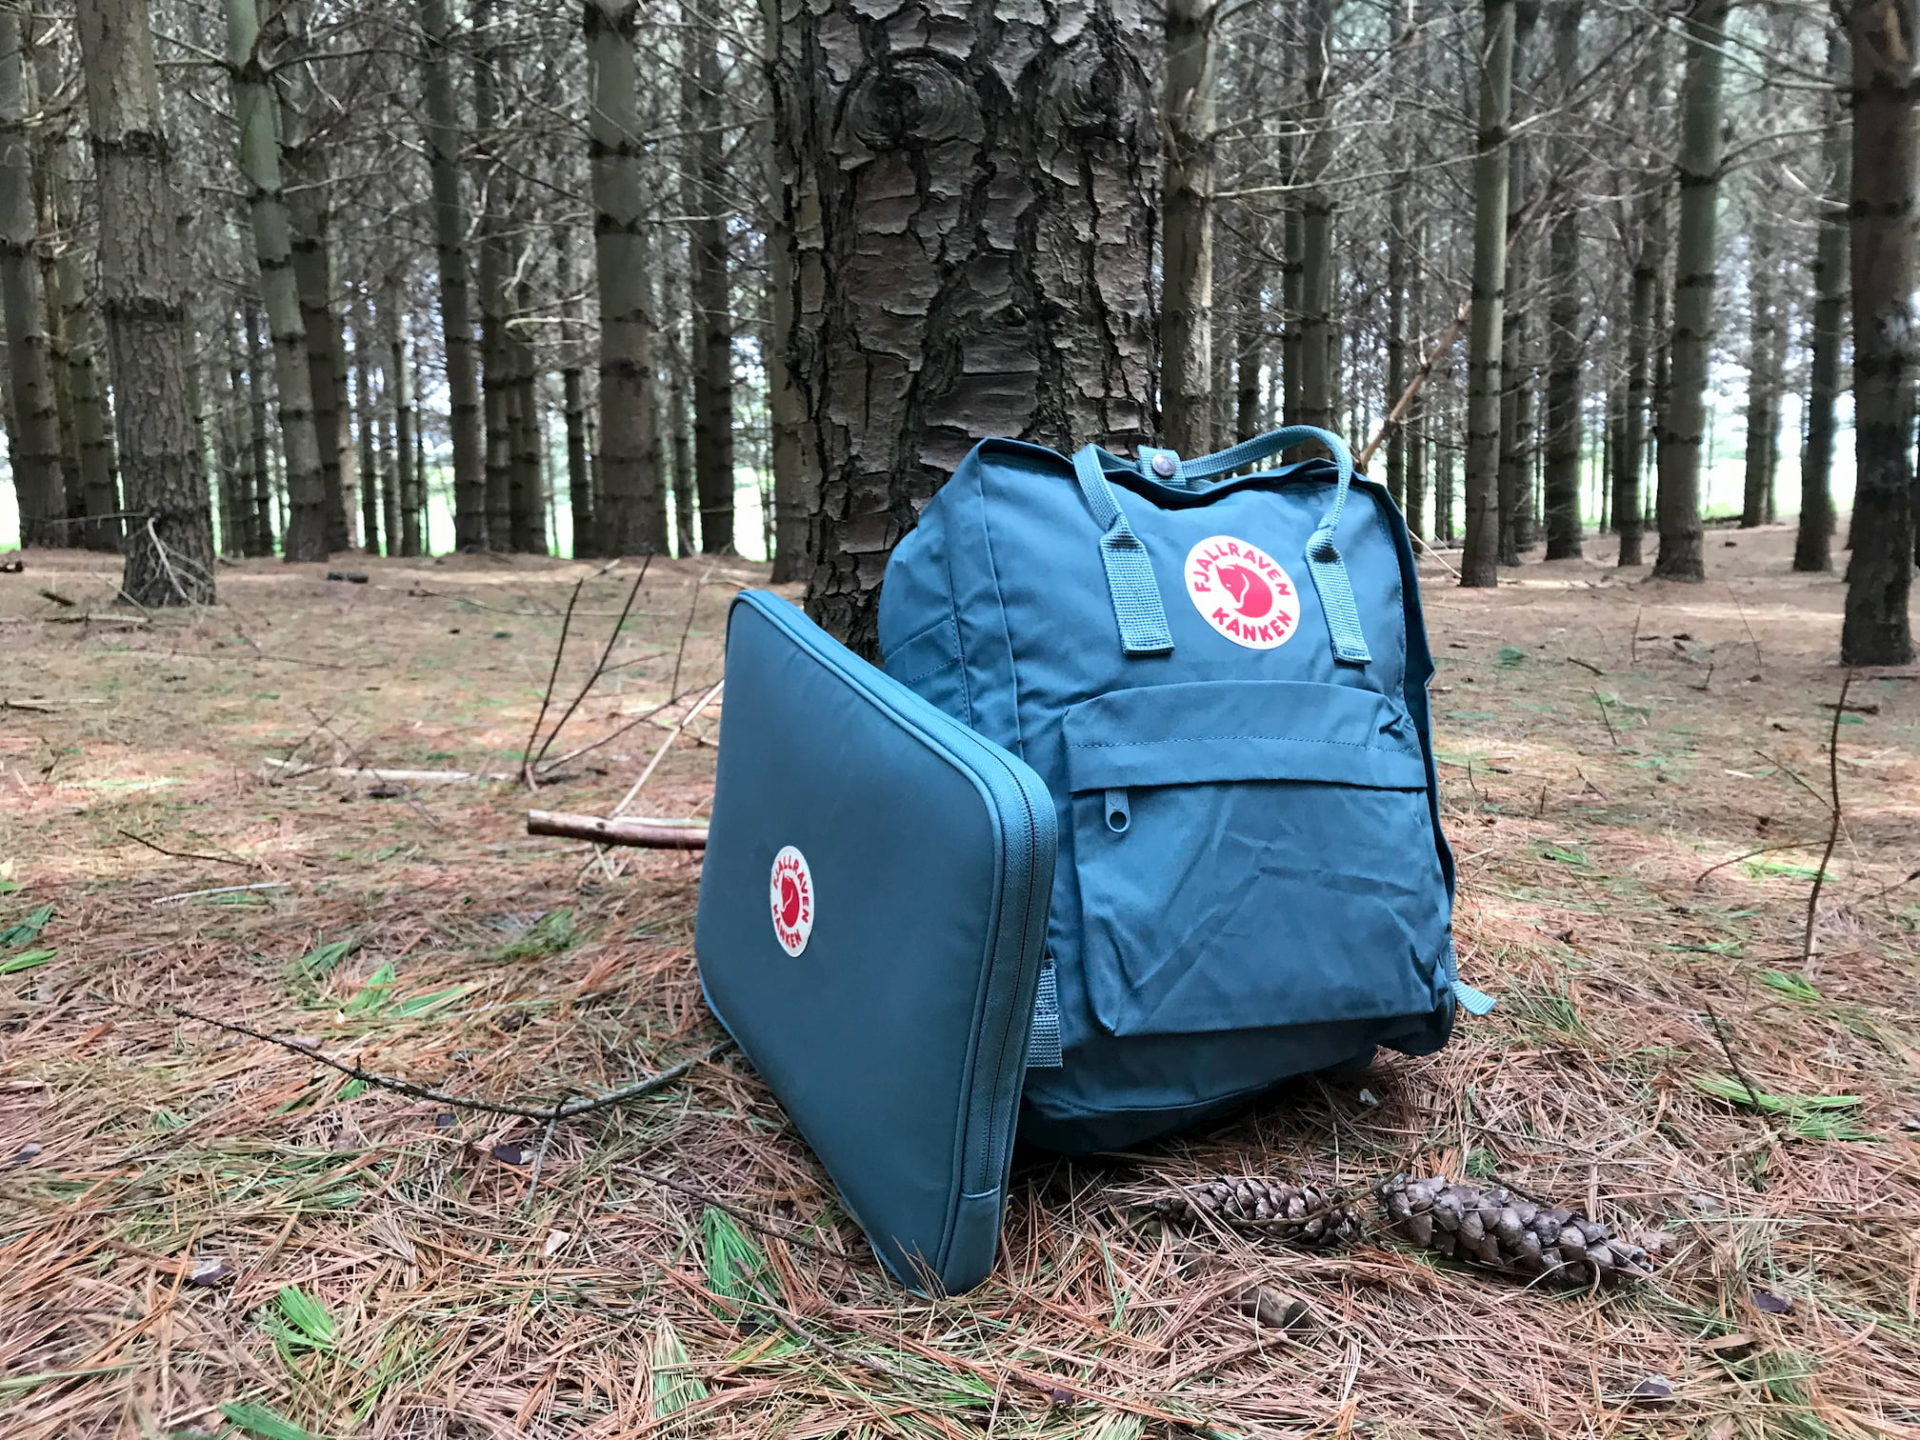 Fjallraven Kanken backpack reviewed by Mountain Life Media